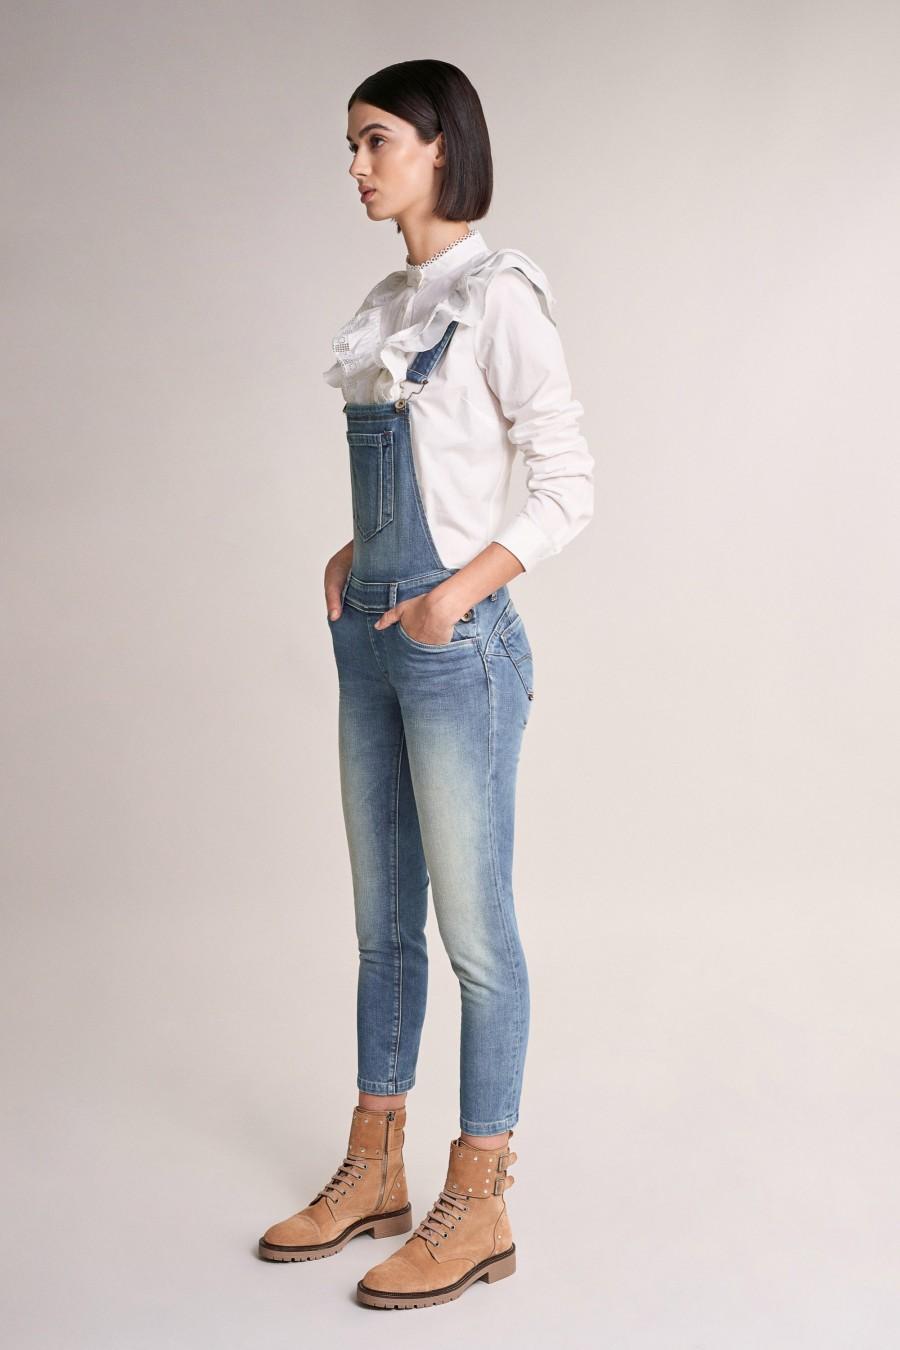 SALOPETTE 914 - SALSA Jean